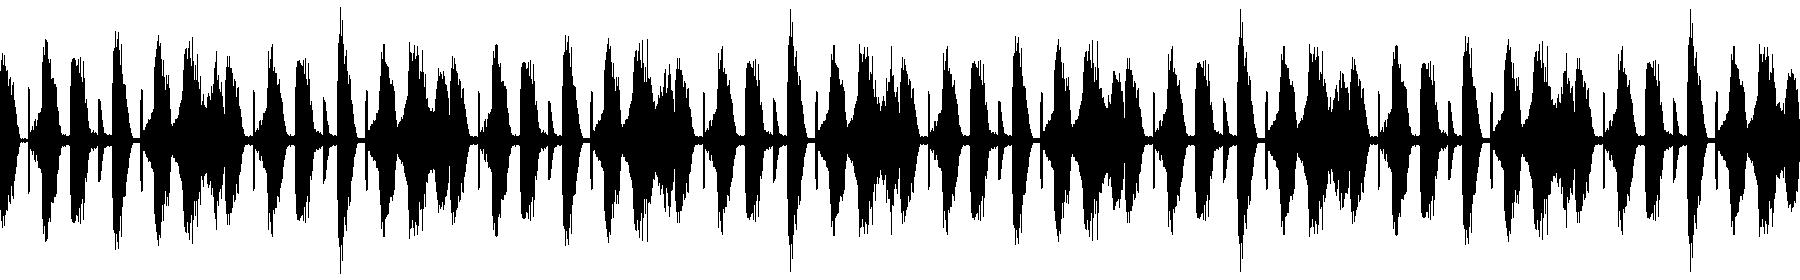 dts chordlp 32 d